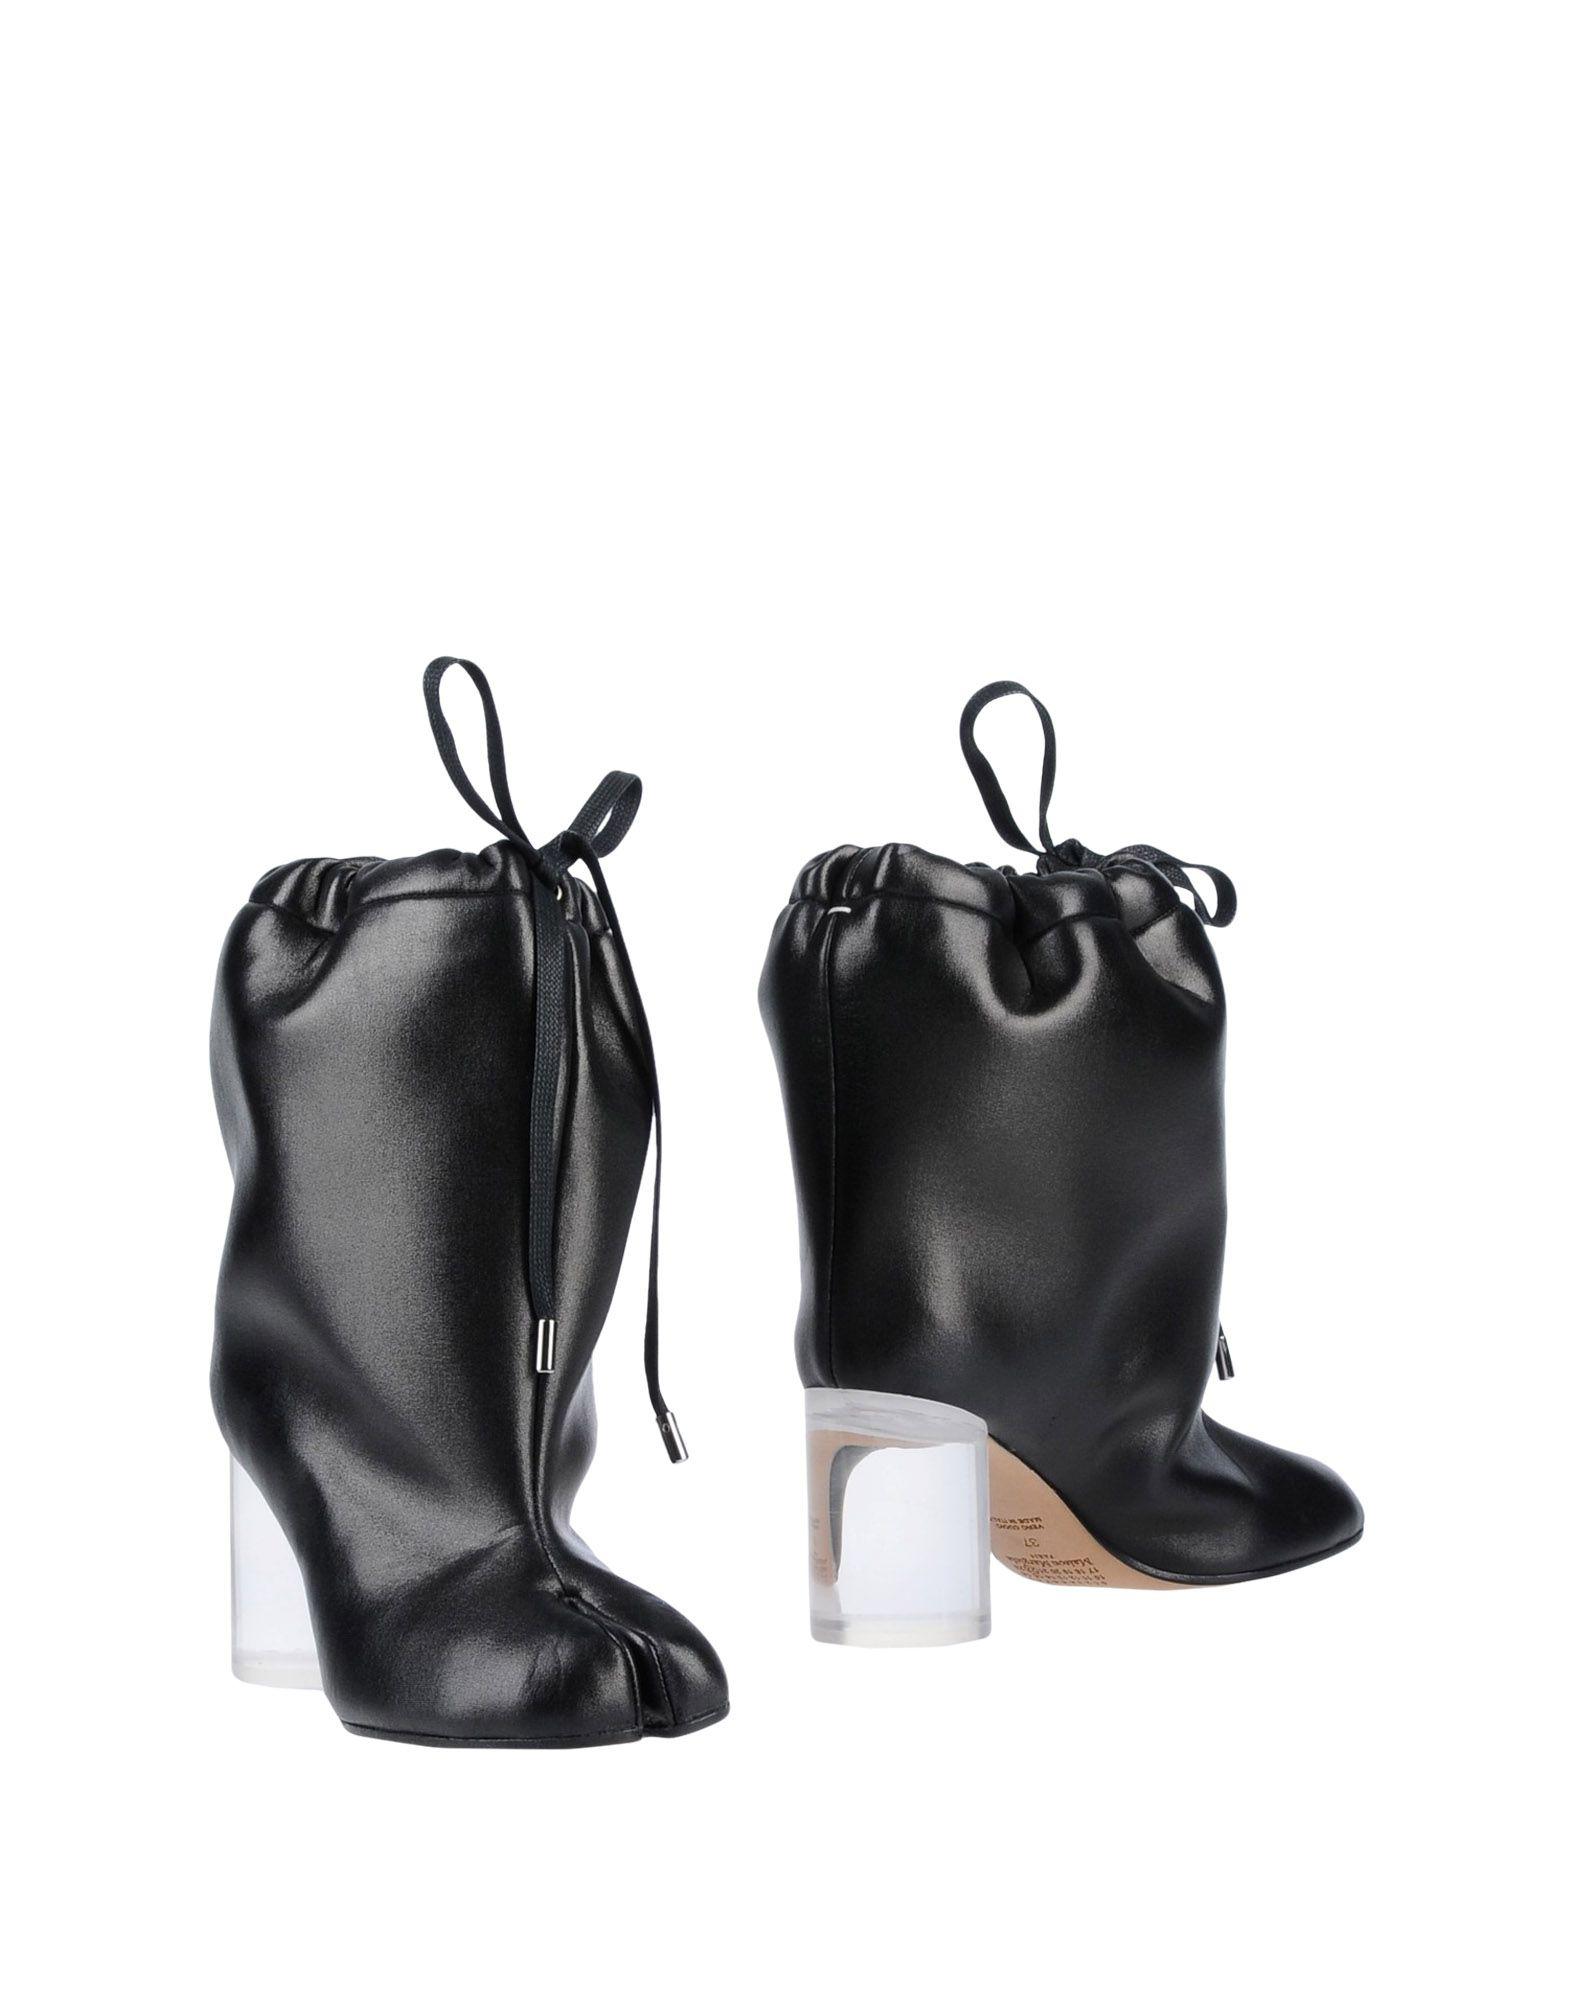 Maison Women Margiela Ankle Boot - Women Maison Maison Margiela Ankle Boots online on  Canada - 11471926SV f257e8